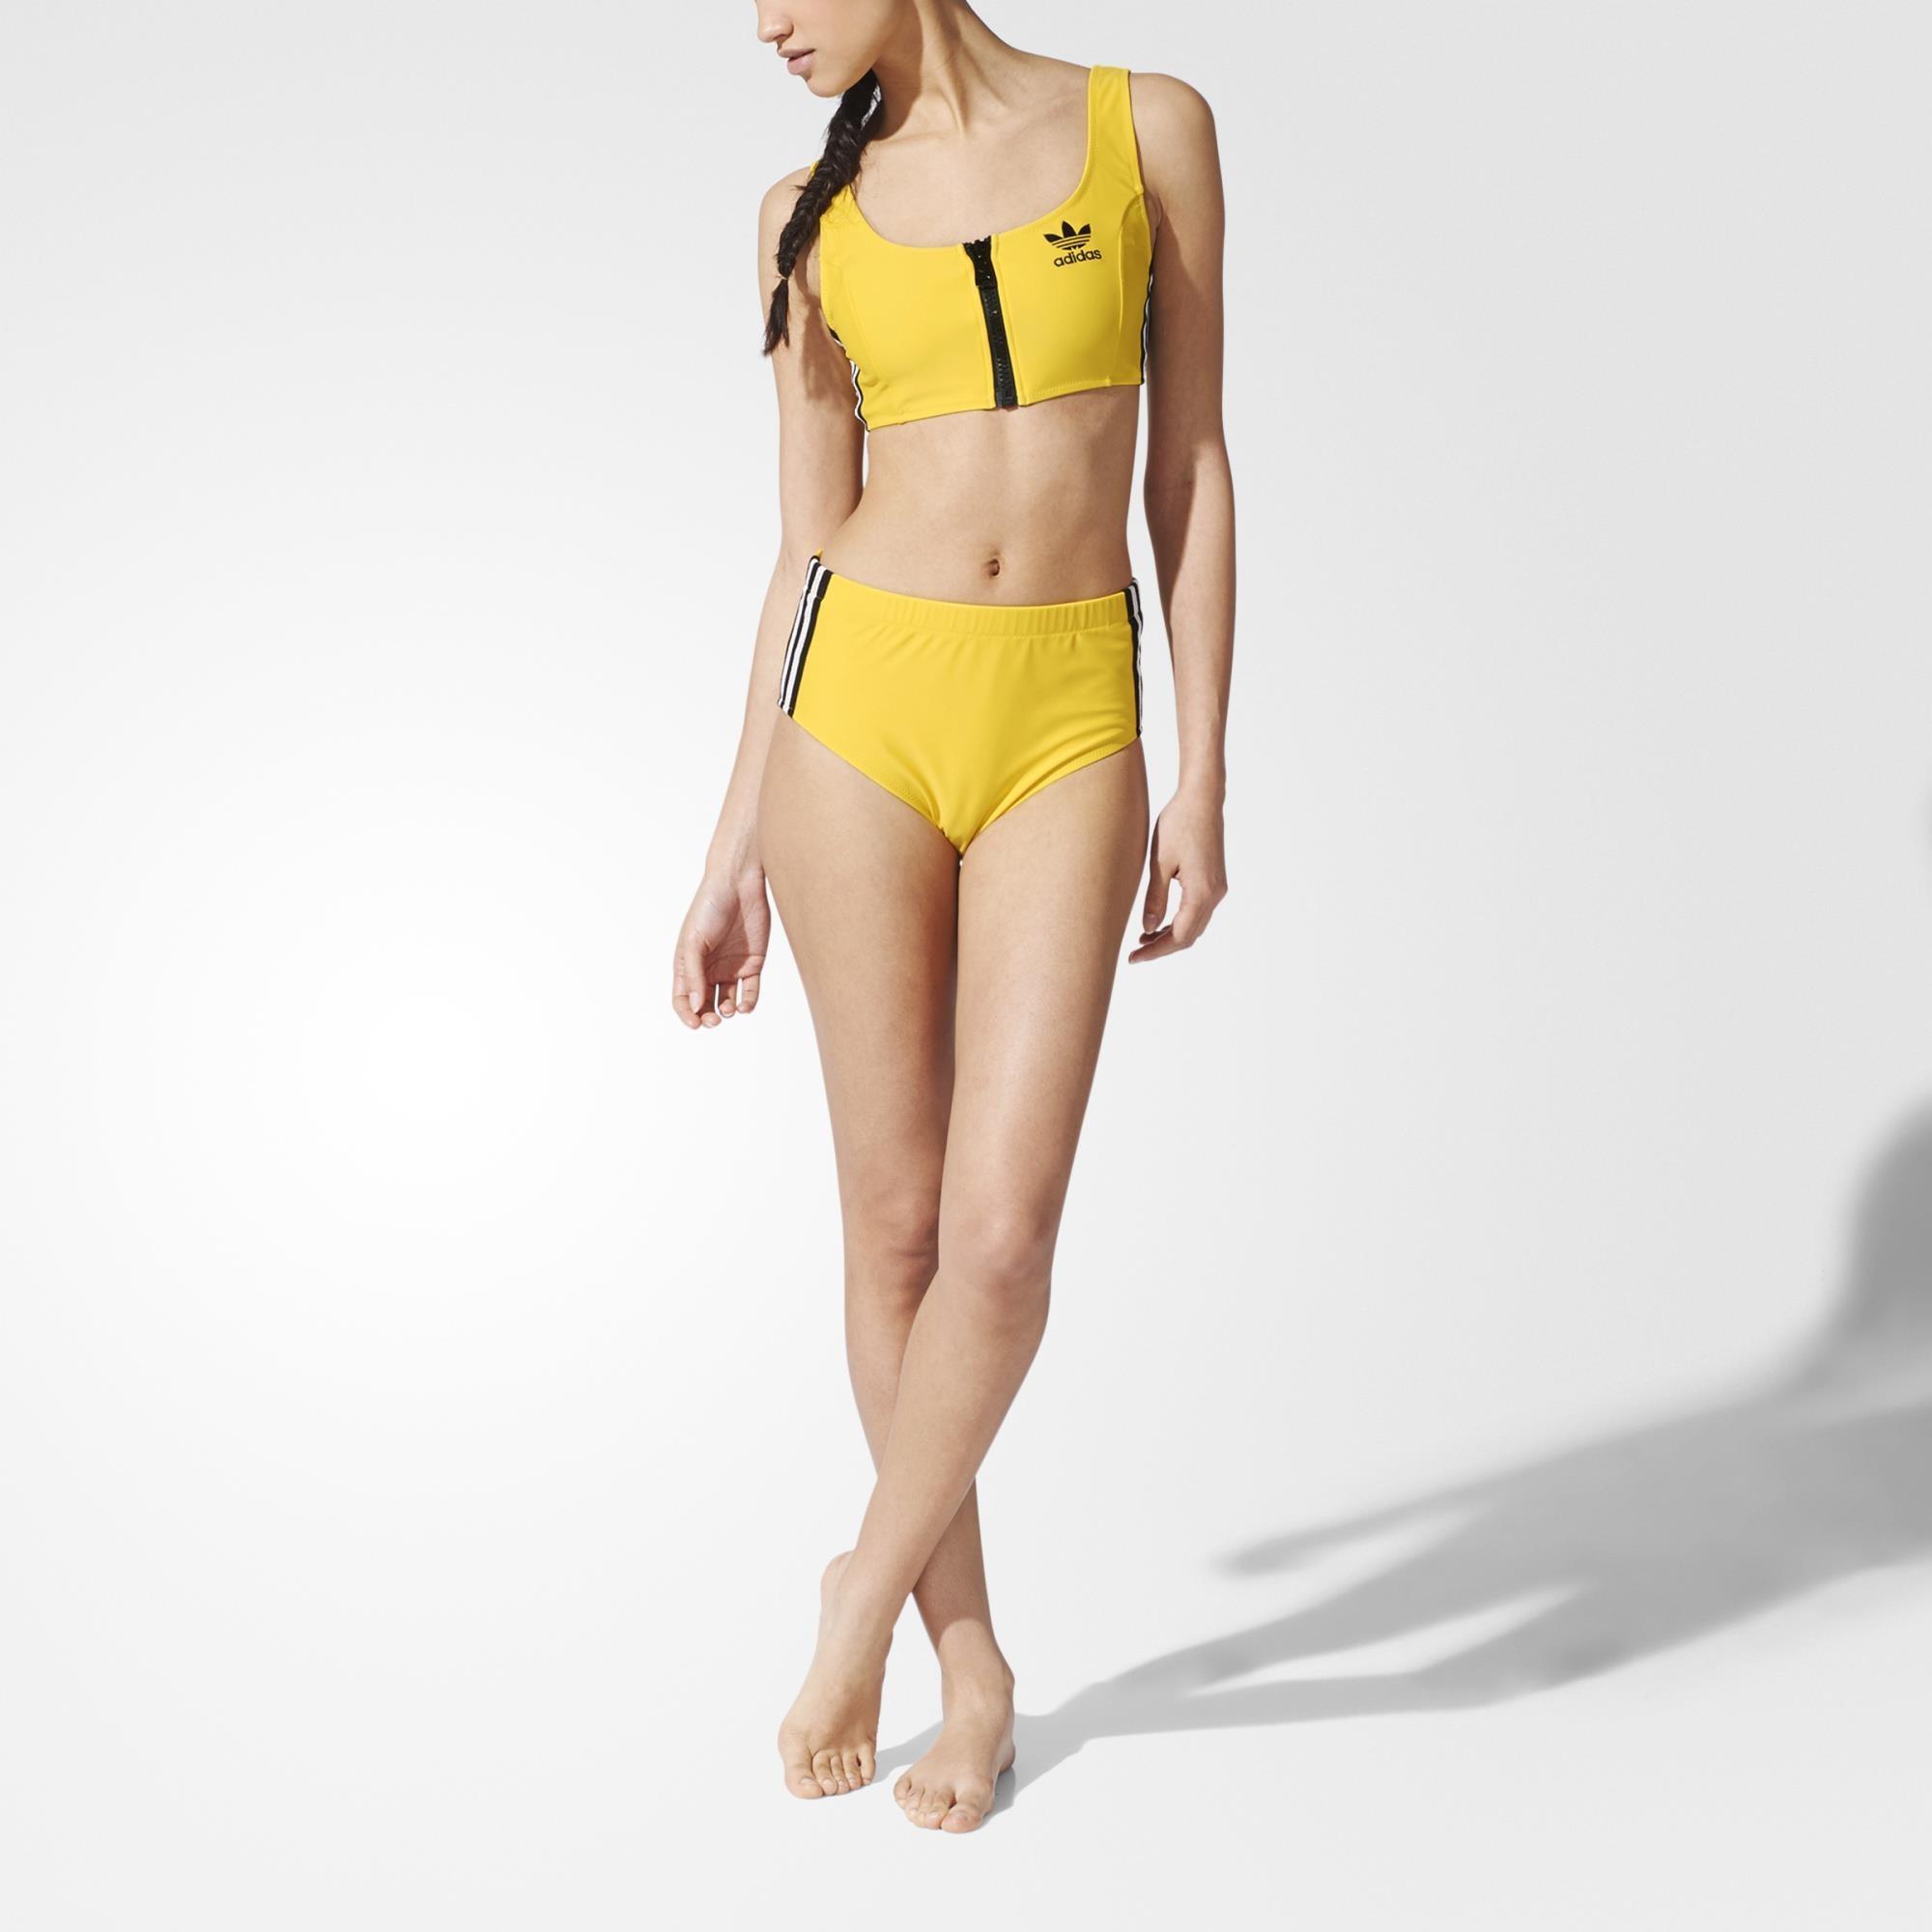 Adidas Women S Nyc Taxi Bikini Yellow Adidas Canada